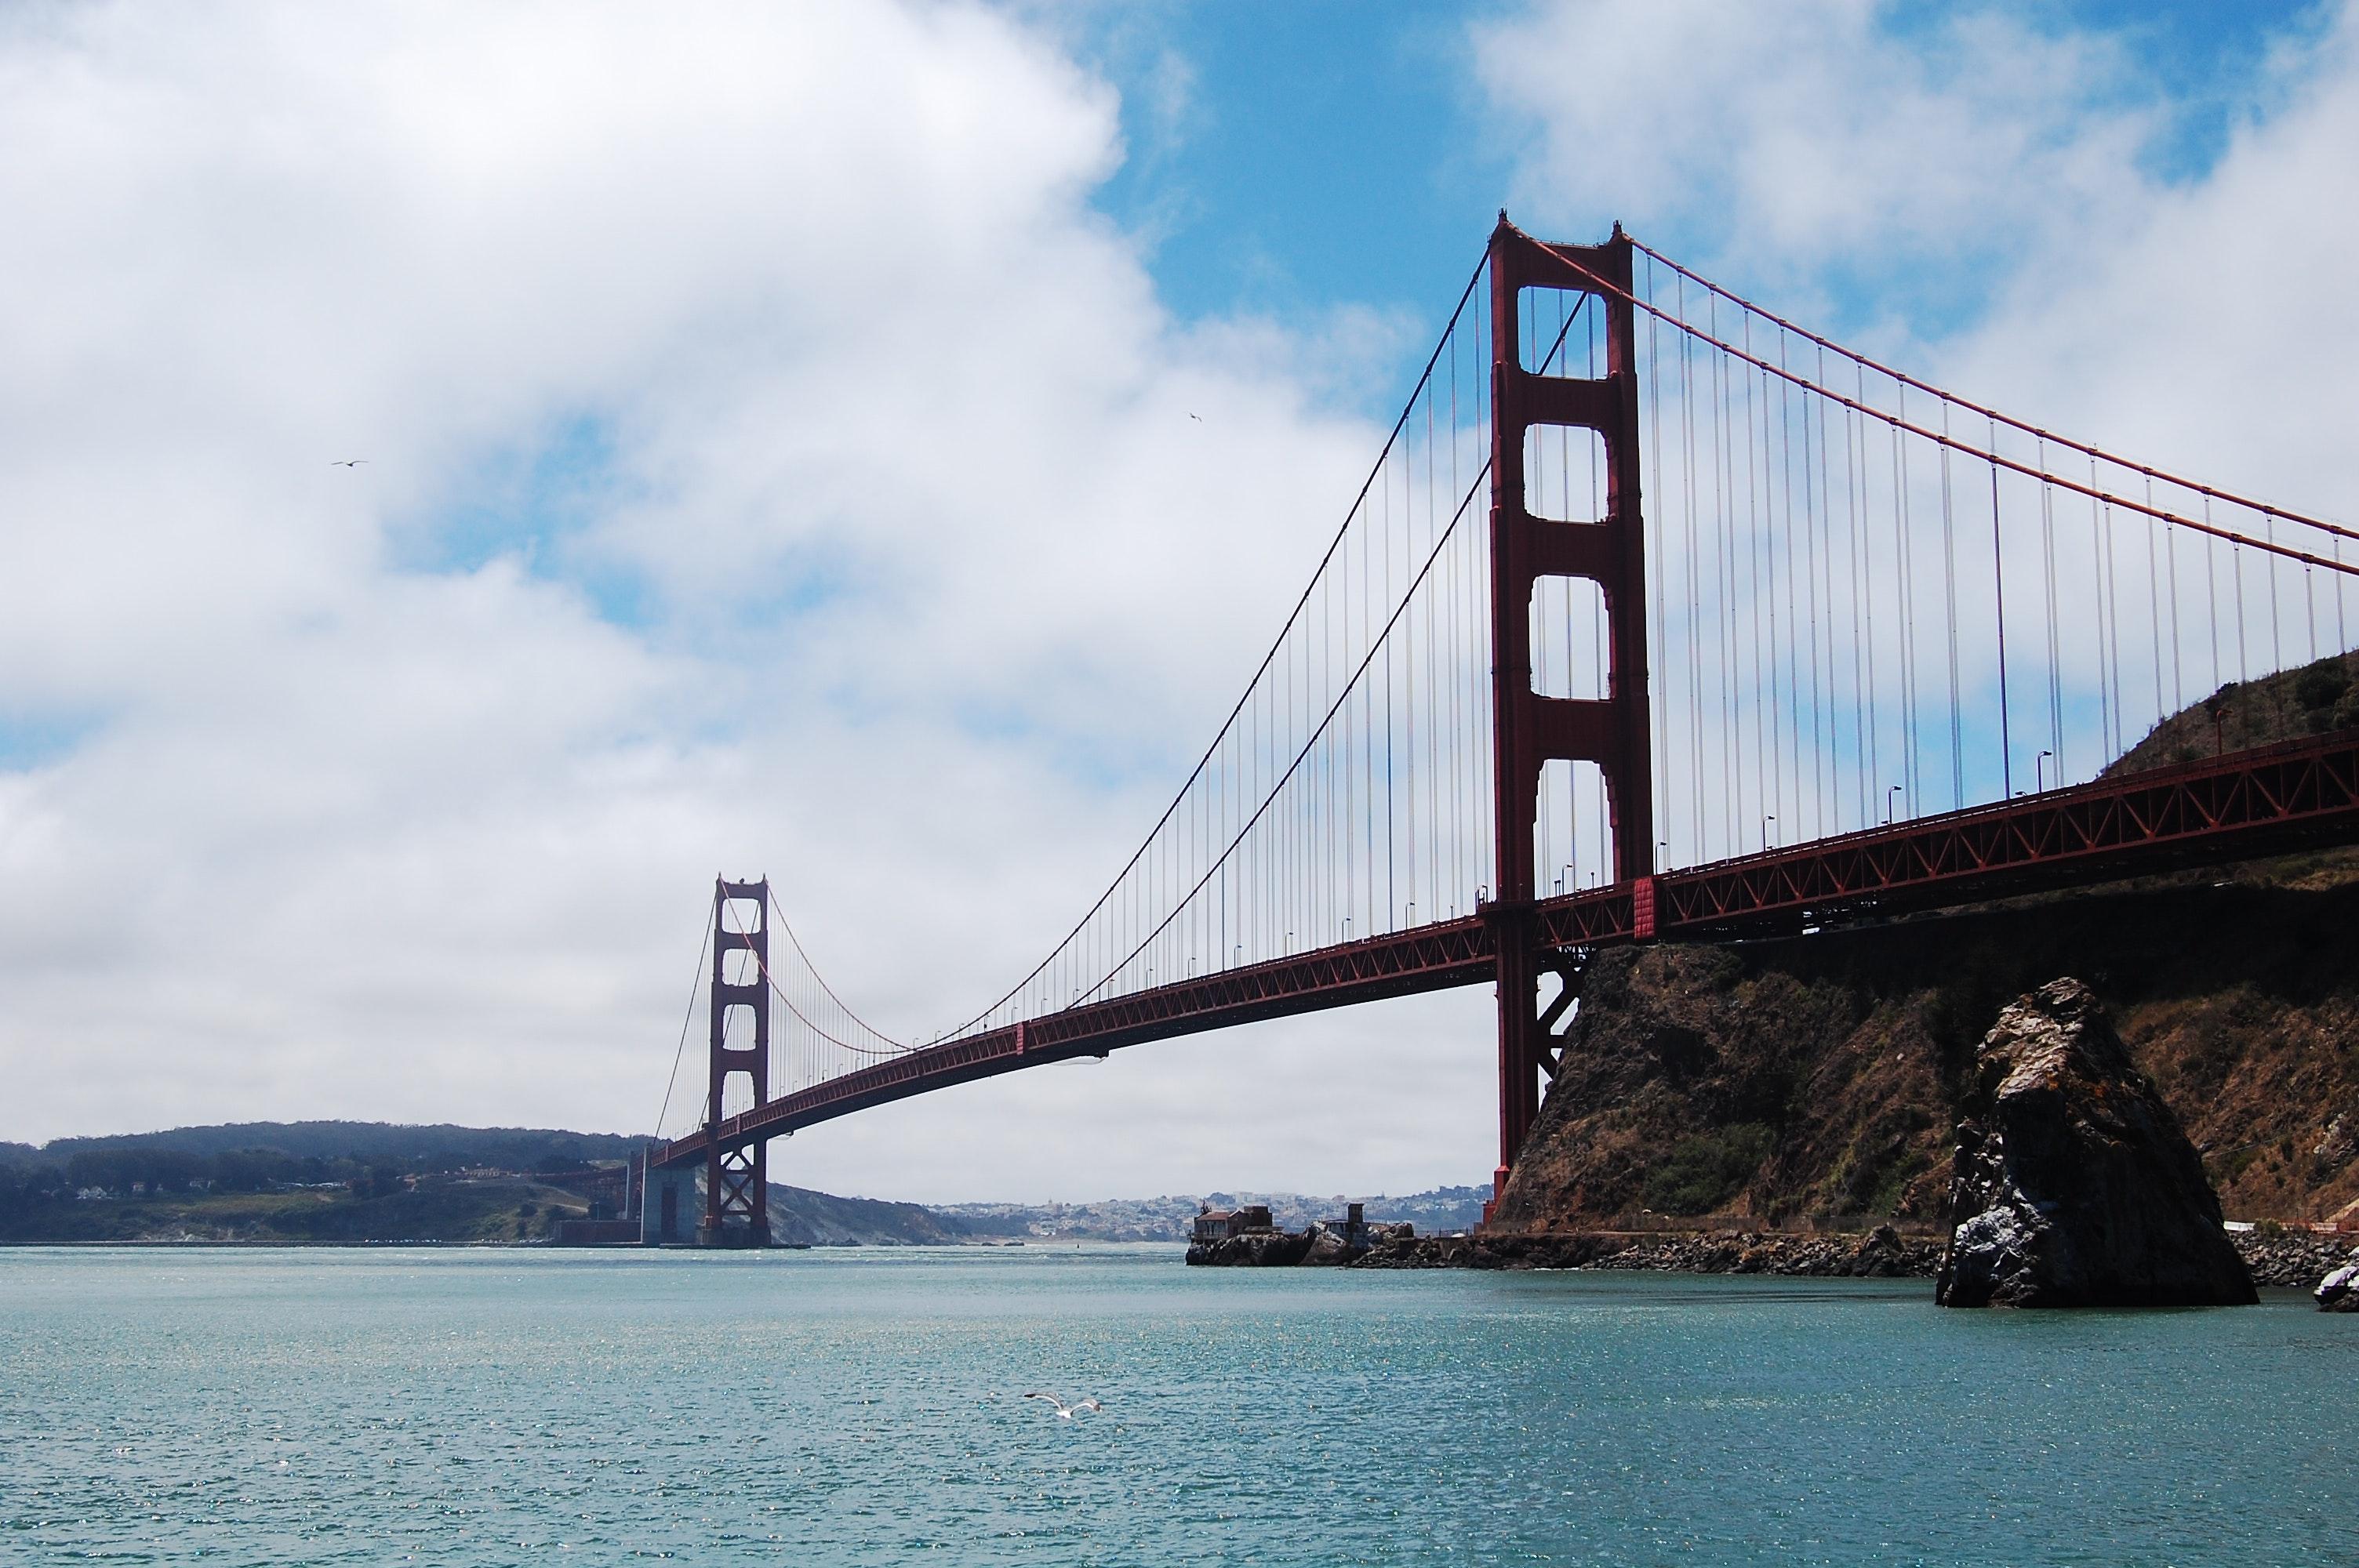 Golden Gate Bridge during Daytime, Architecture, Landscape, Travel, Suspension bridge, HQ Photo